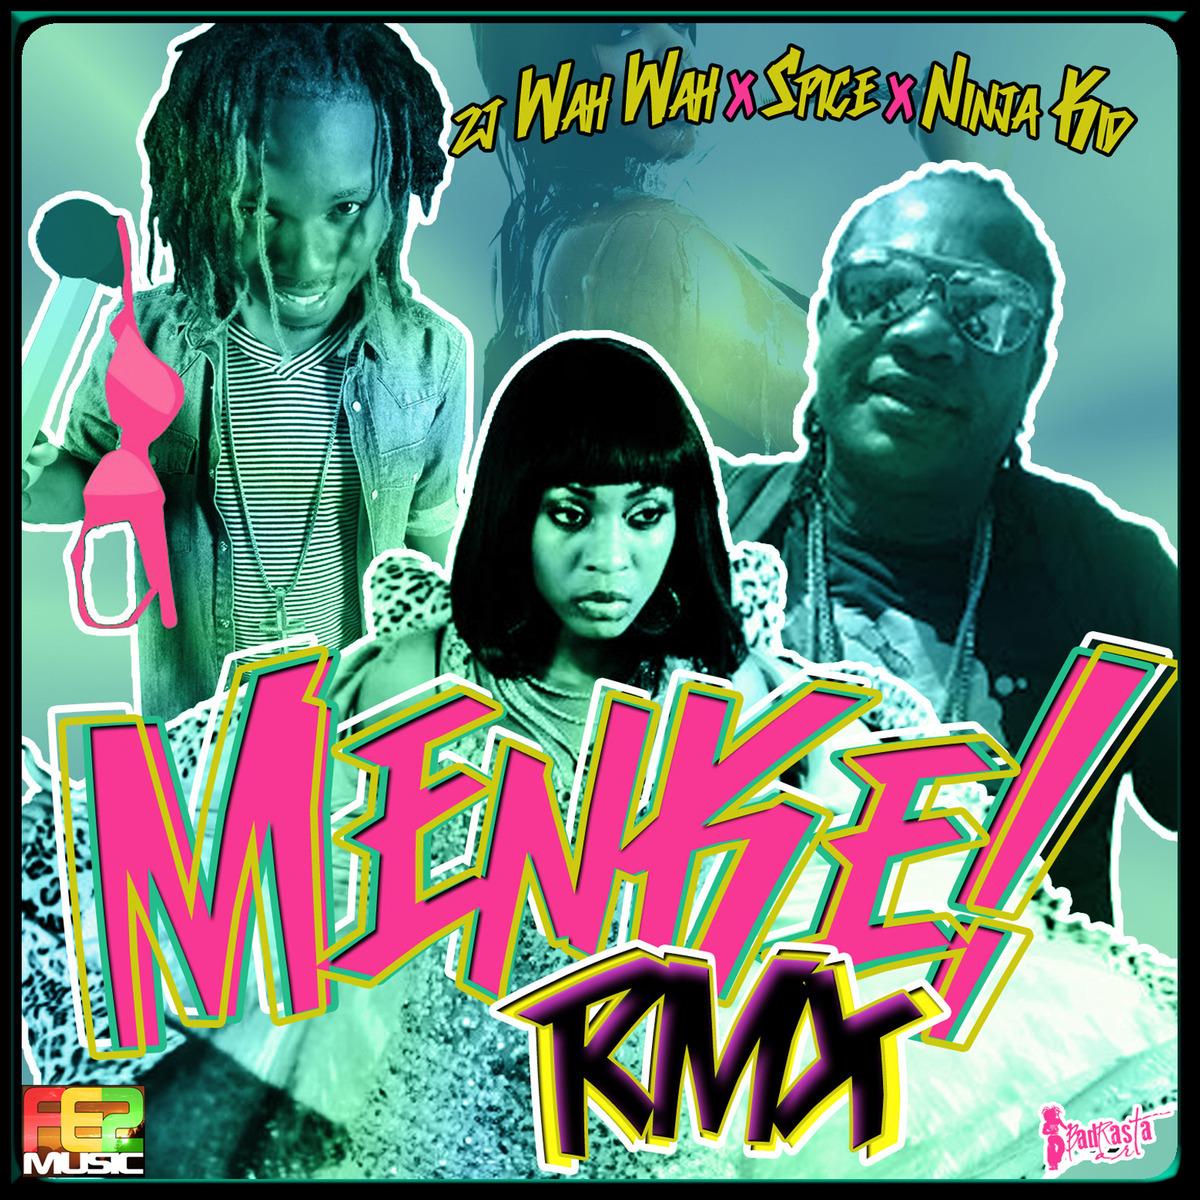 ZJ WAHWA FT. NINJA KID & SPICE – MENKE (REMIX) – FE2 MUSIC